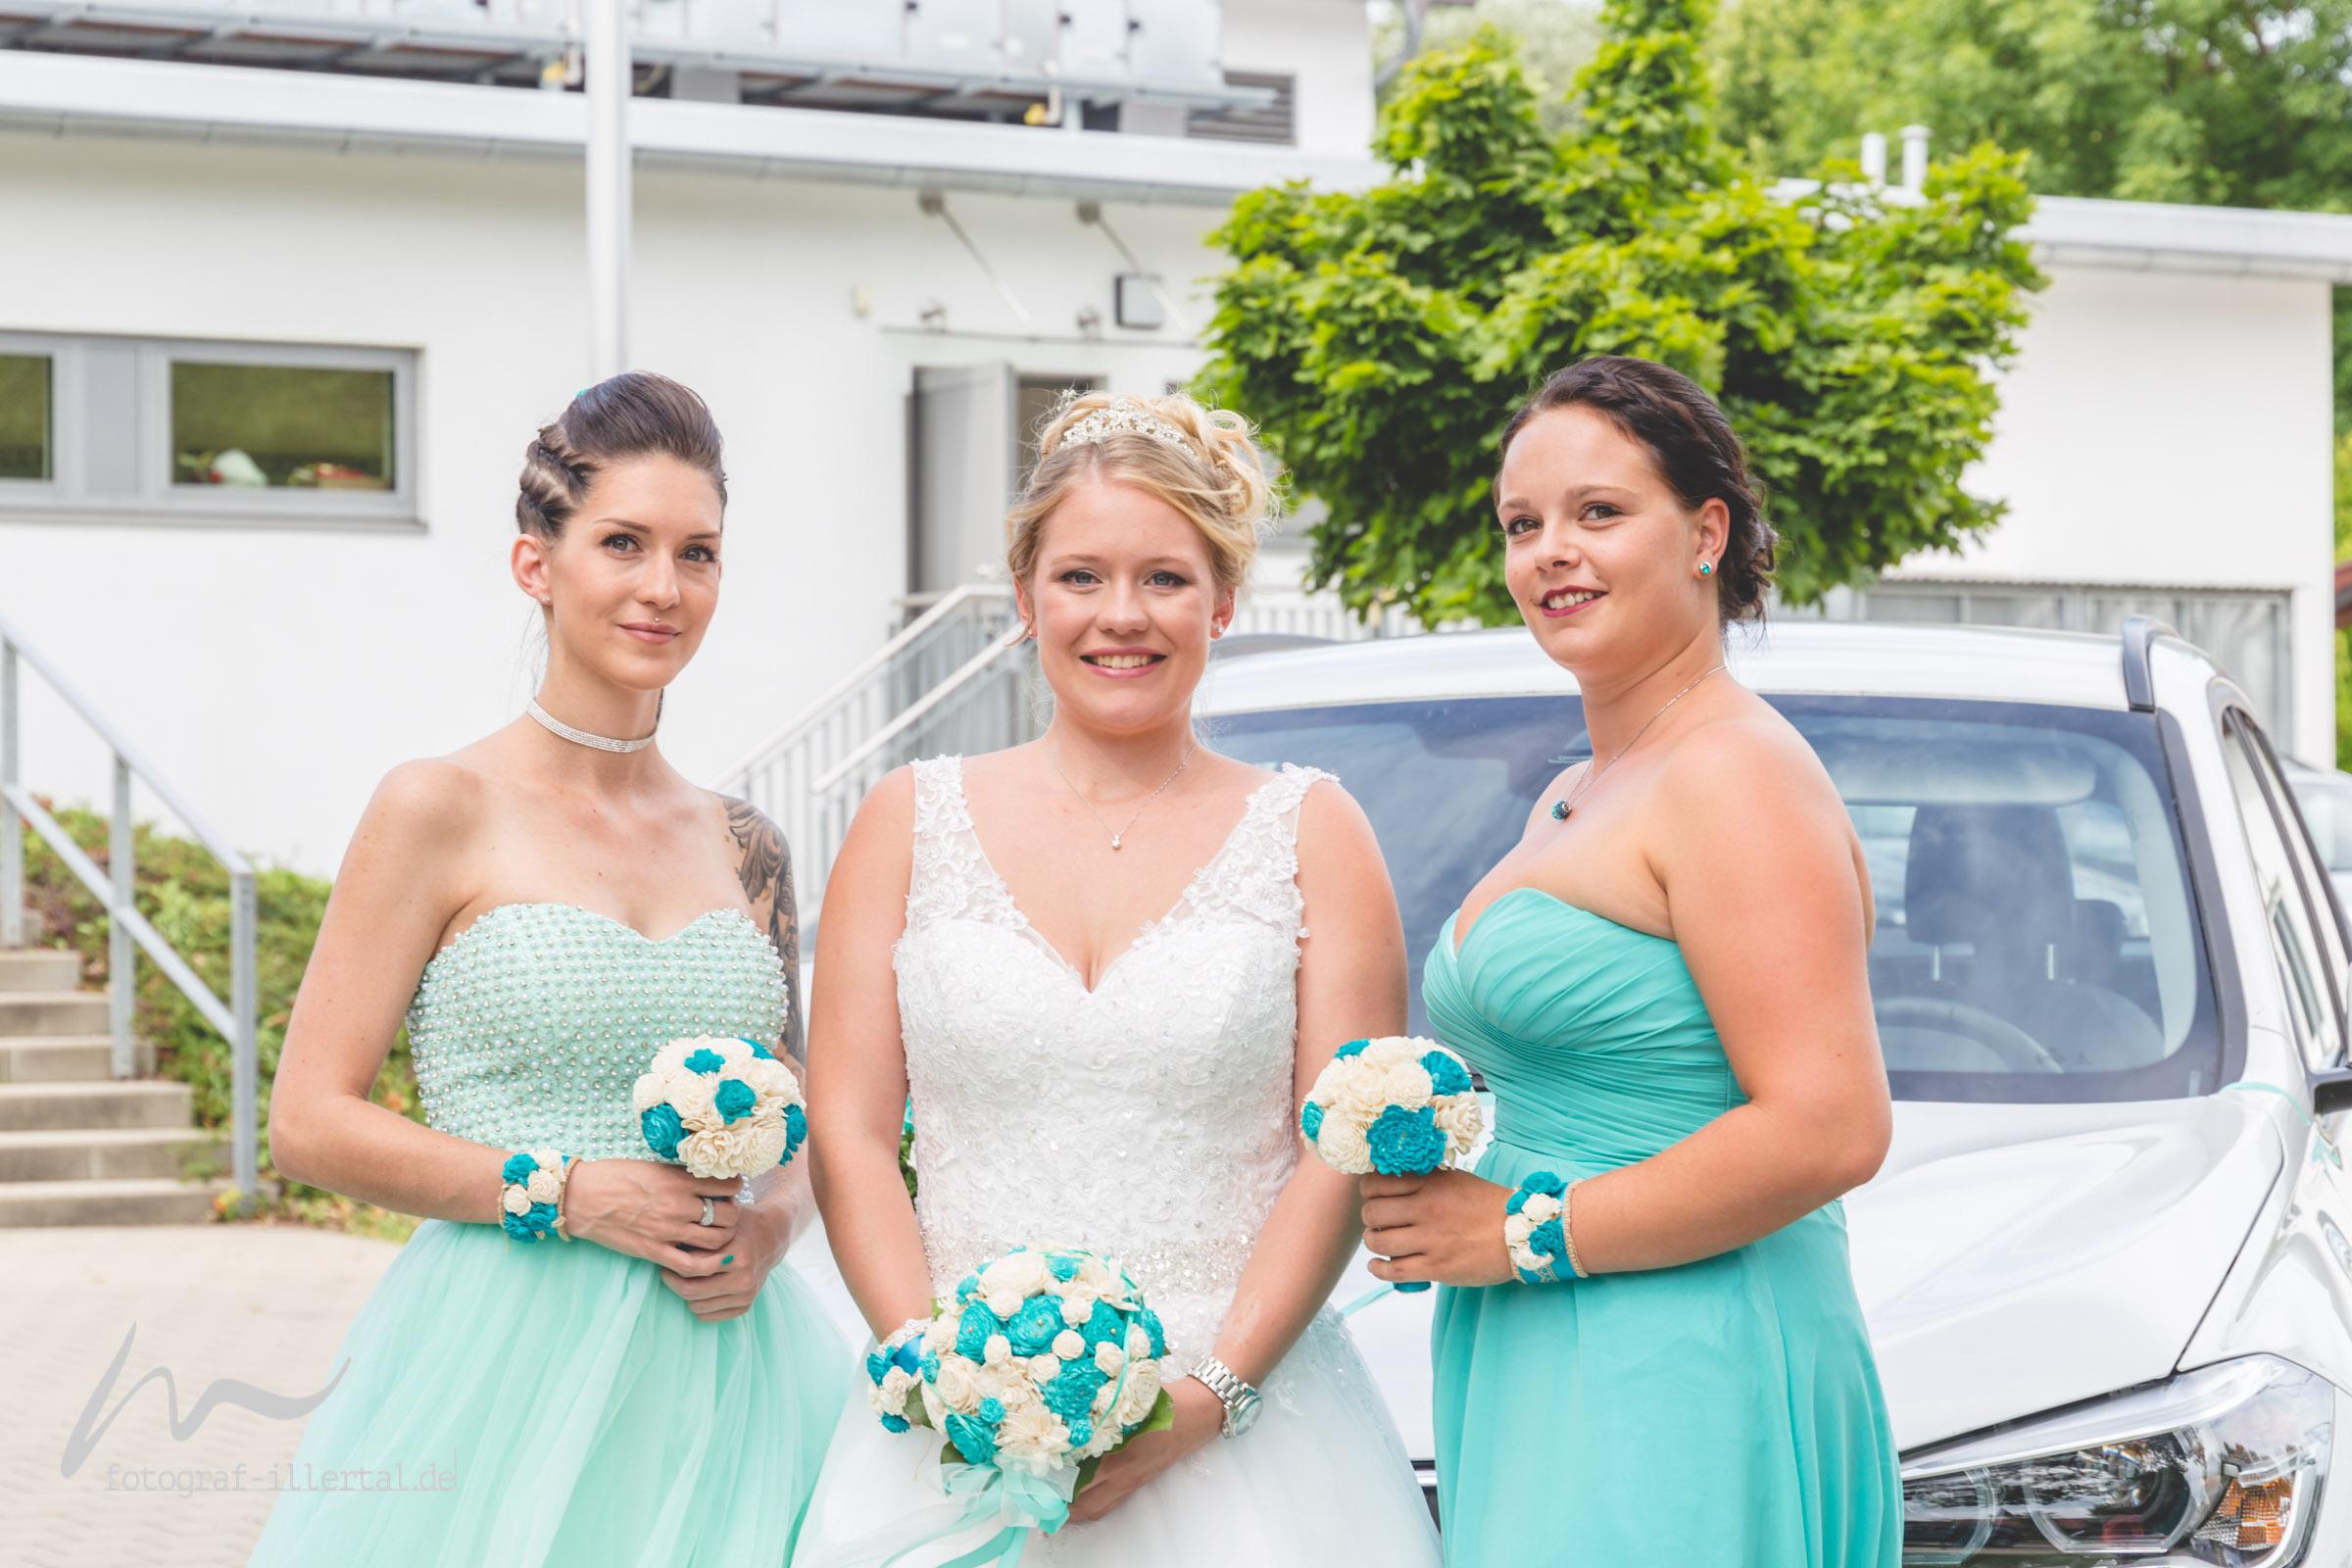 Fotograf Illertal-Christian Miller-Hochzeitsfotografie-_MG_6169